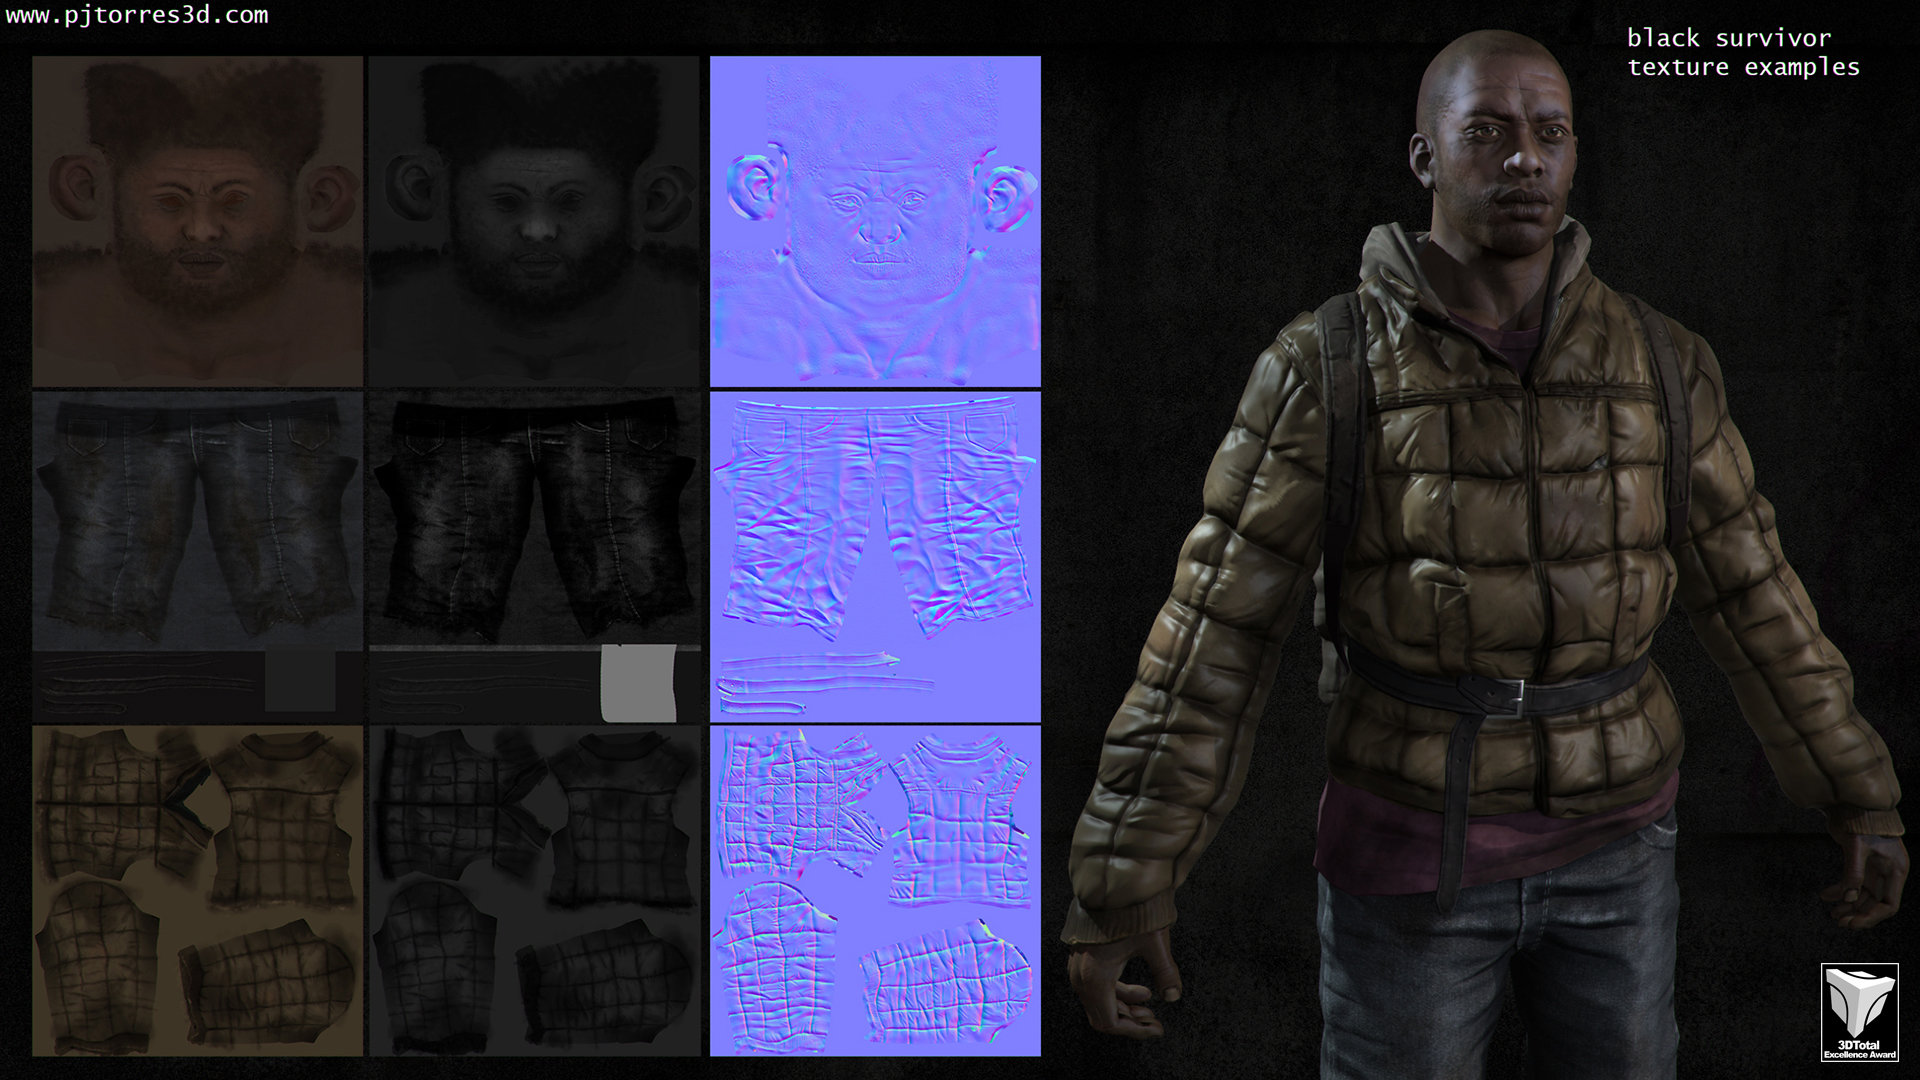 Pedro jose torres blacksurvivor textures